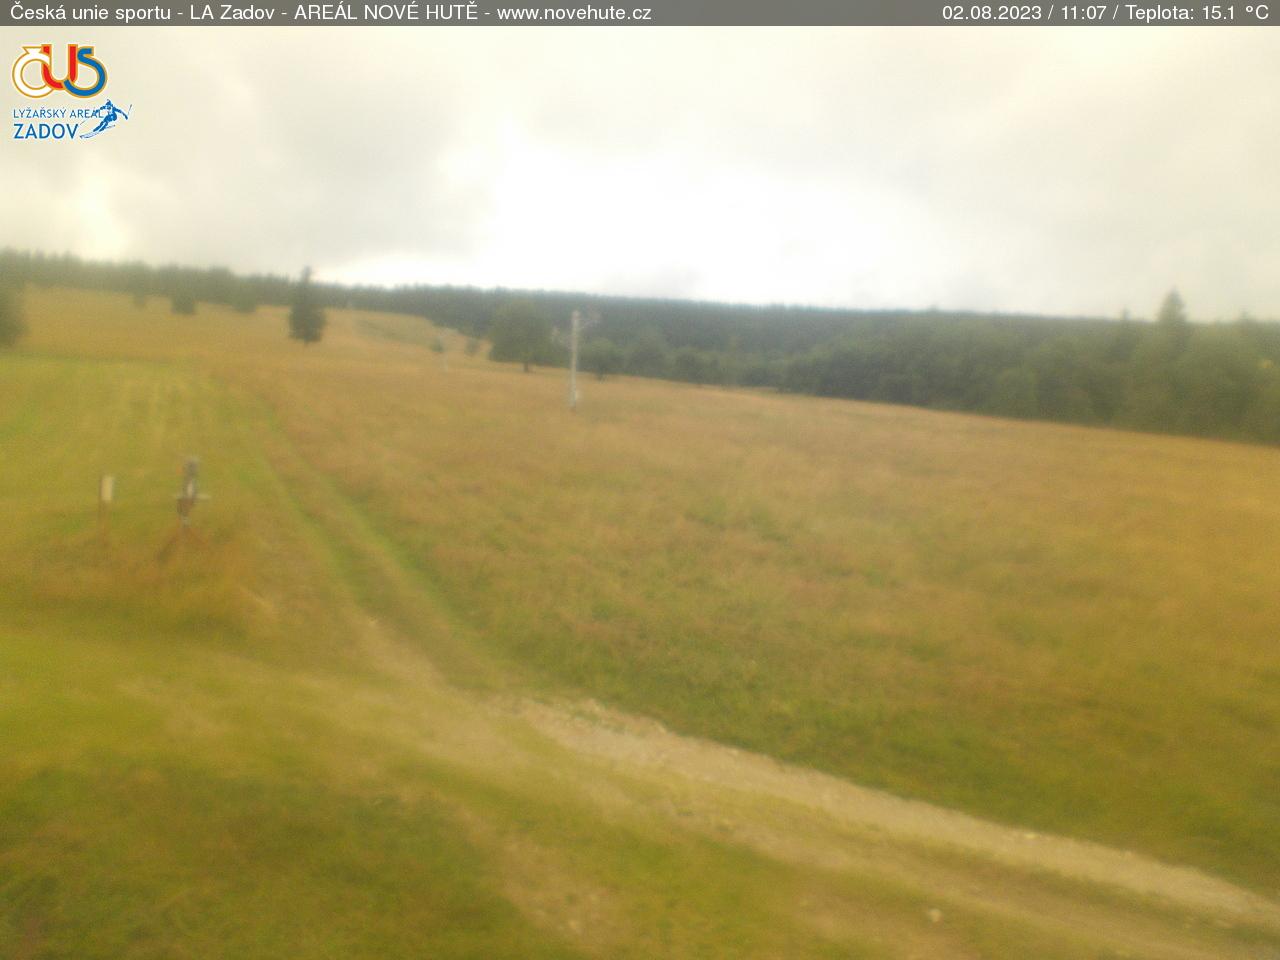 Webcam Skigebied Zadov - Churanov Nove Hute - Bohemer Woud